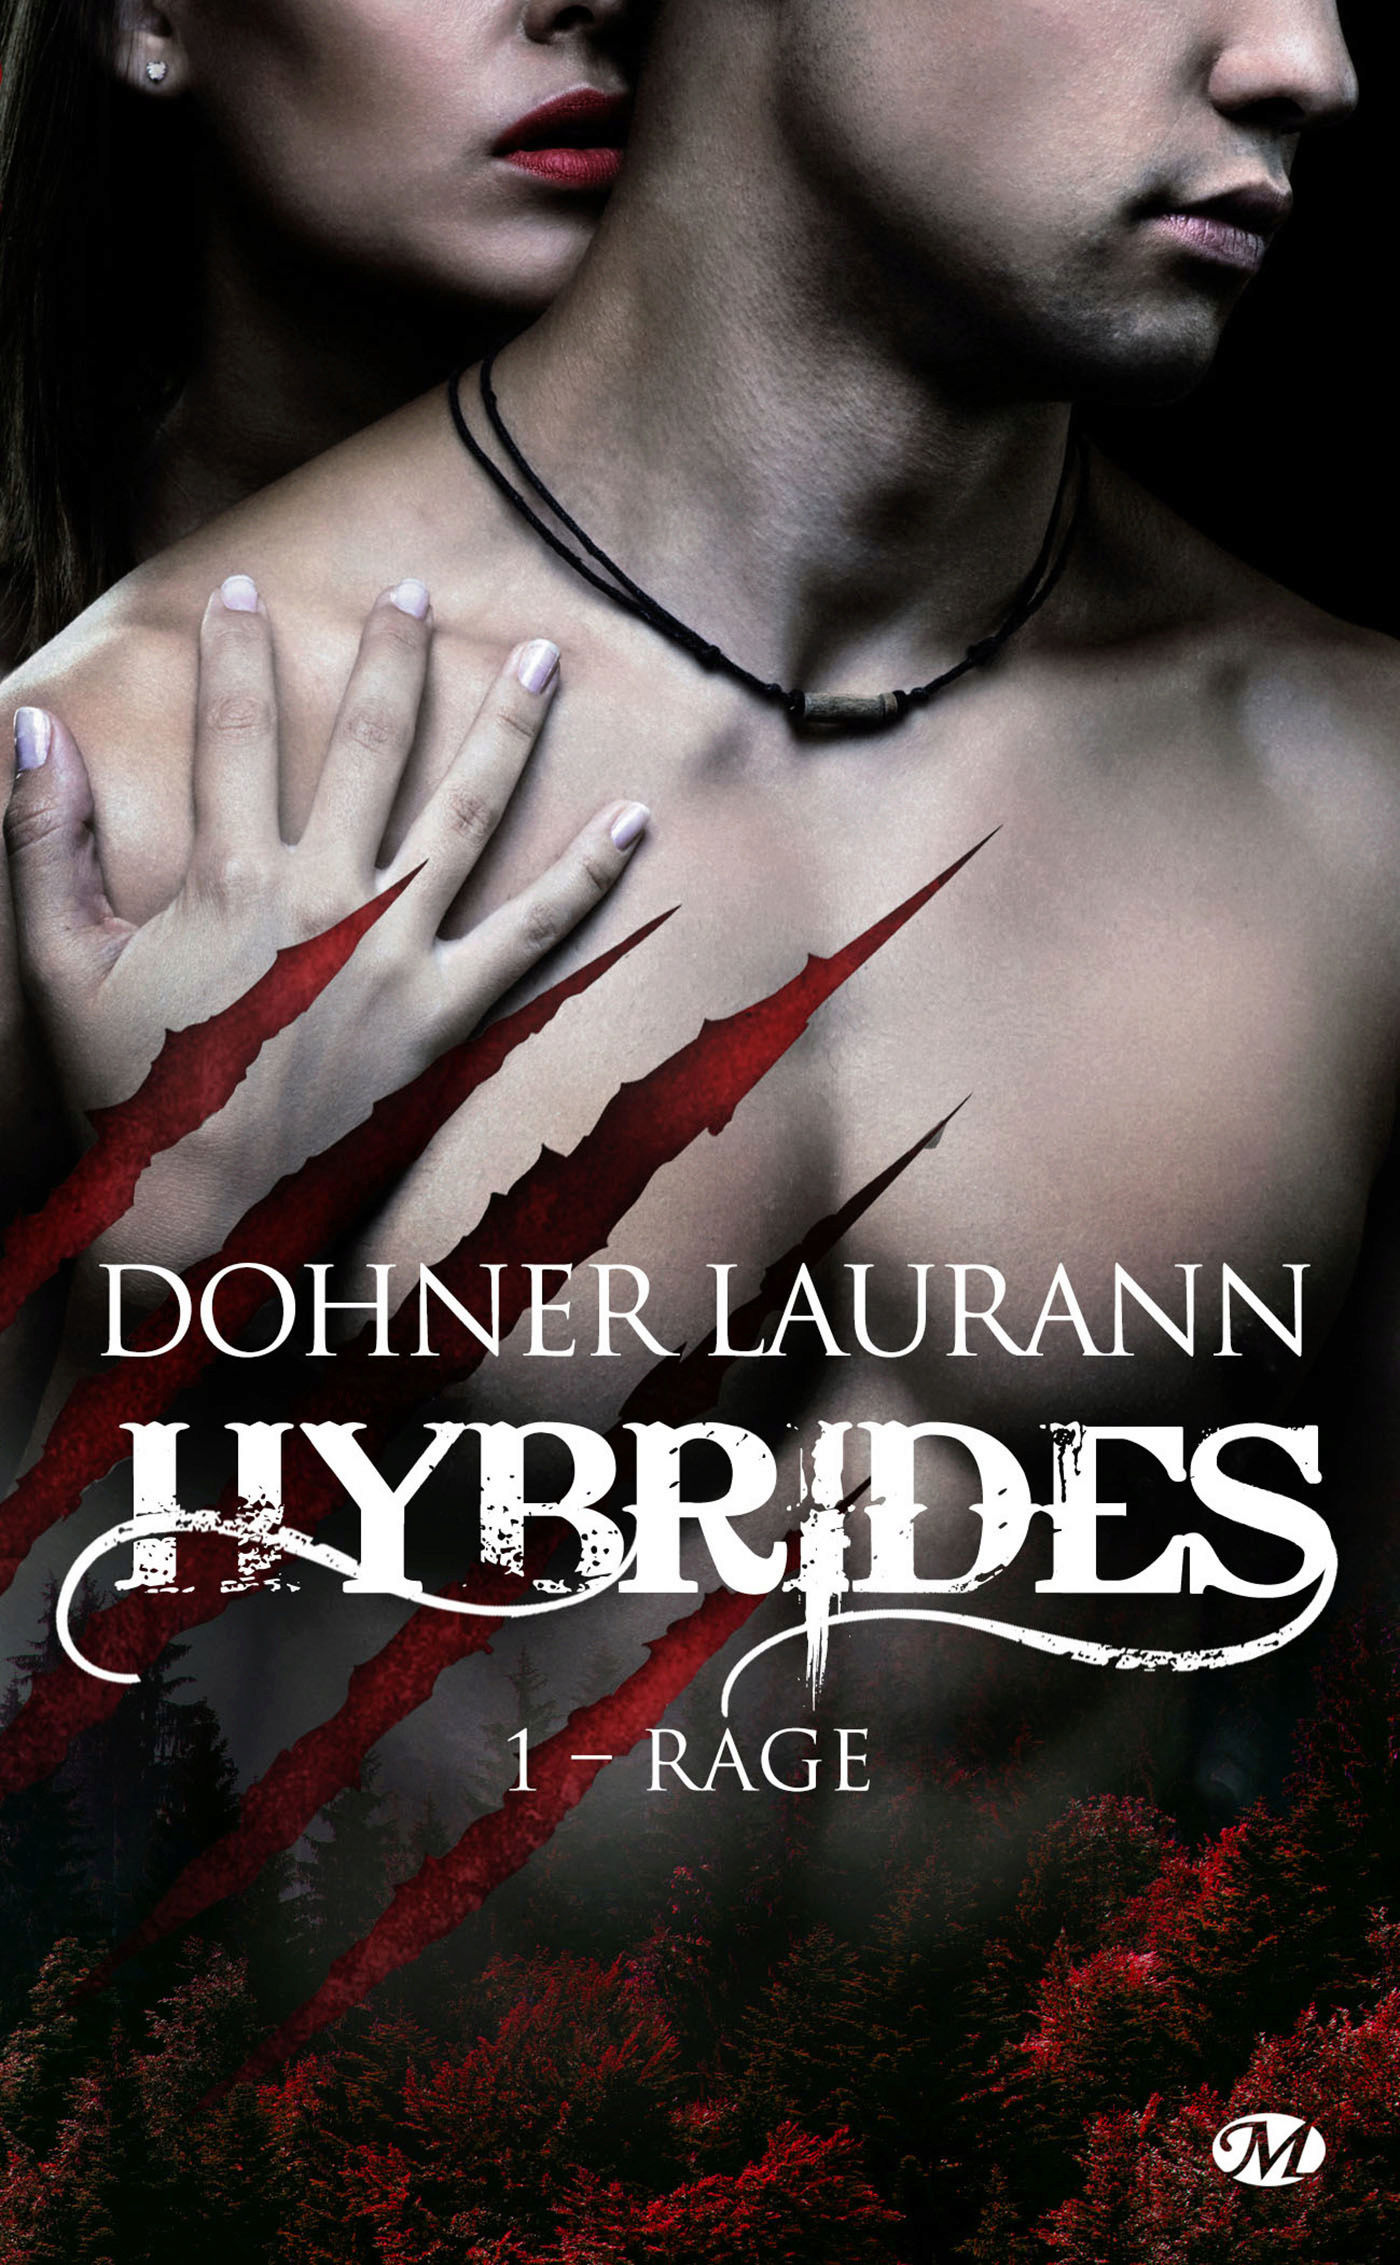 DOHNER Laurann - HYBRIDES - Tome 1 : Rage Hybrid10